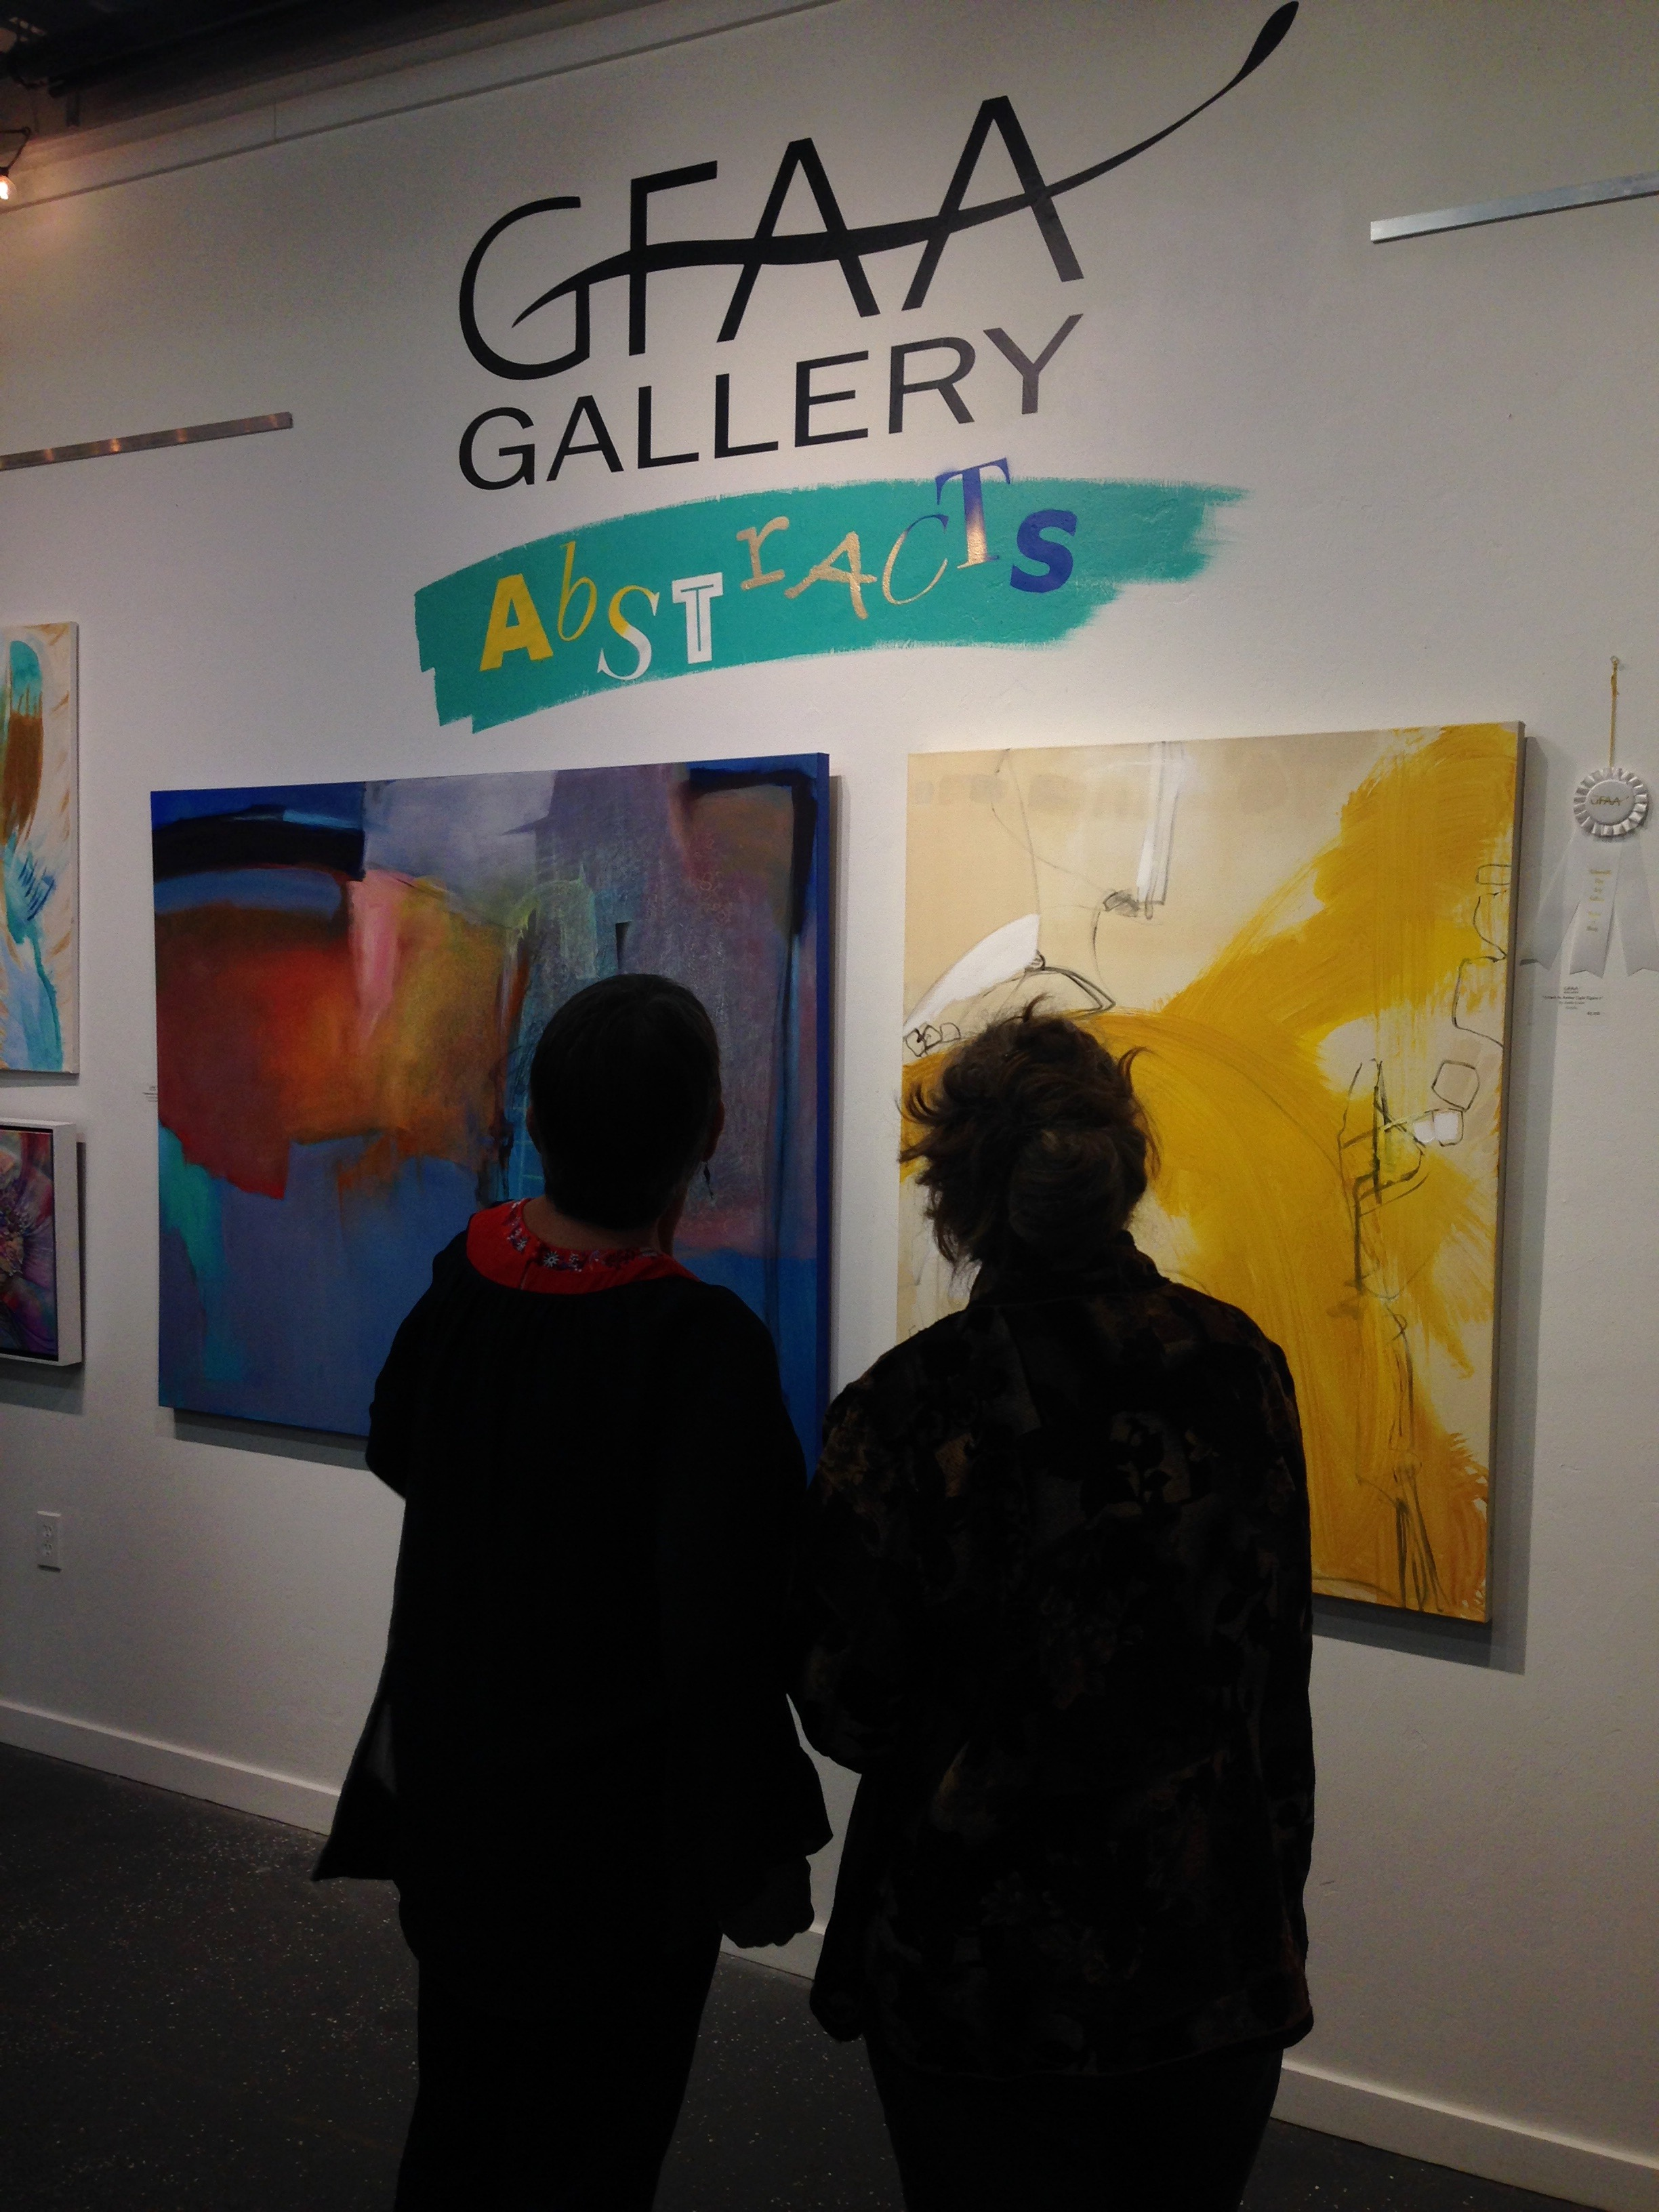 GFAA Gallery Abstracts